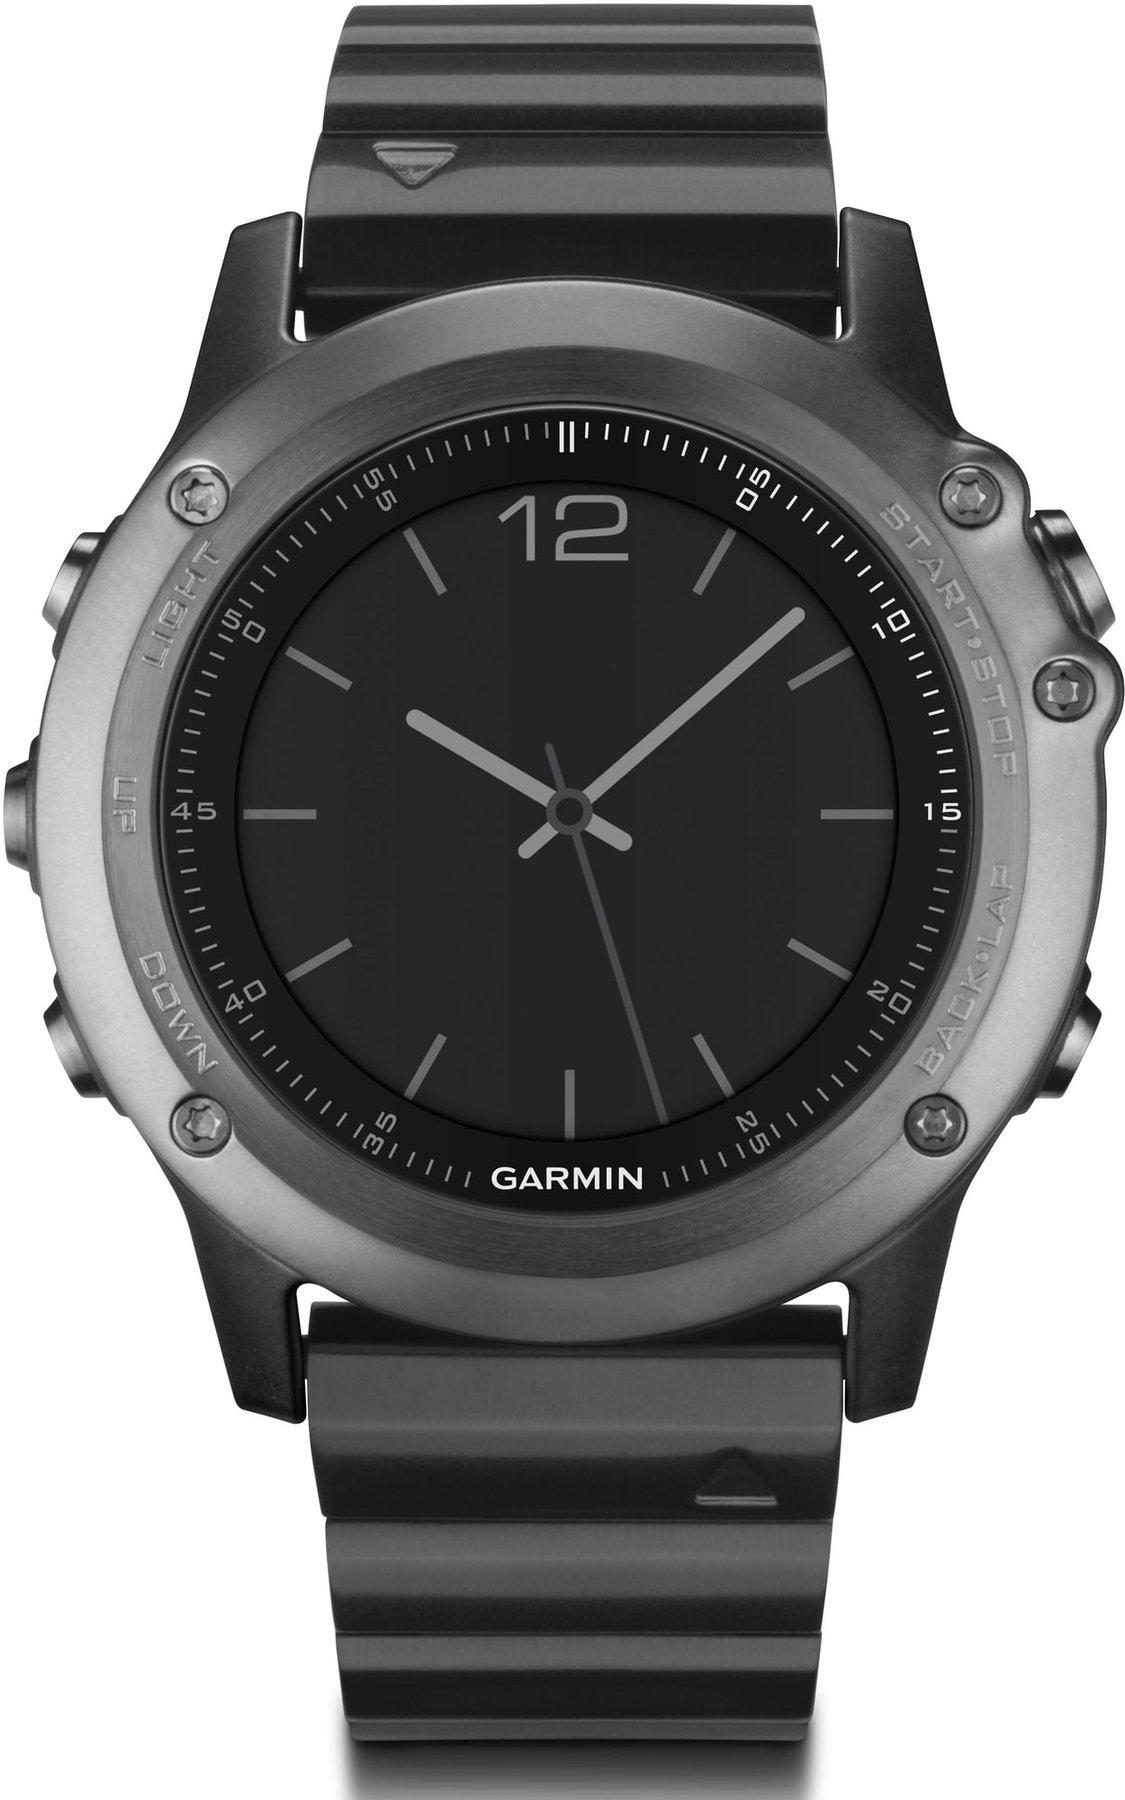 GPS & Sportuhren Garmin Fenix 3 HR Saphir Performer Bundle Grau günstig kaufen